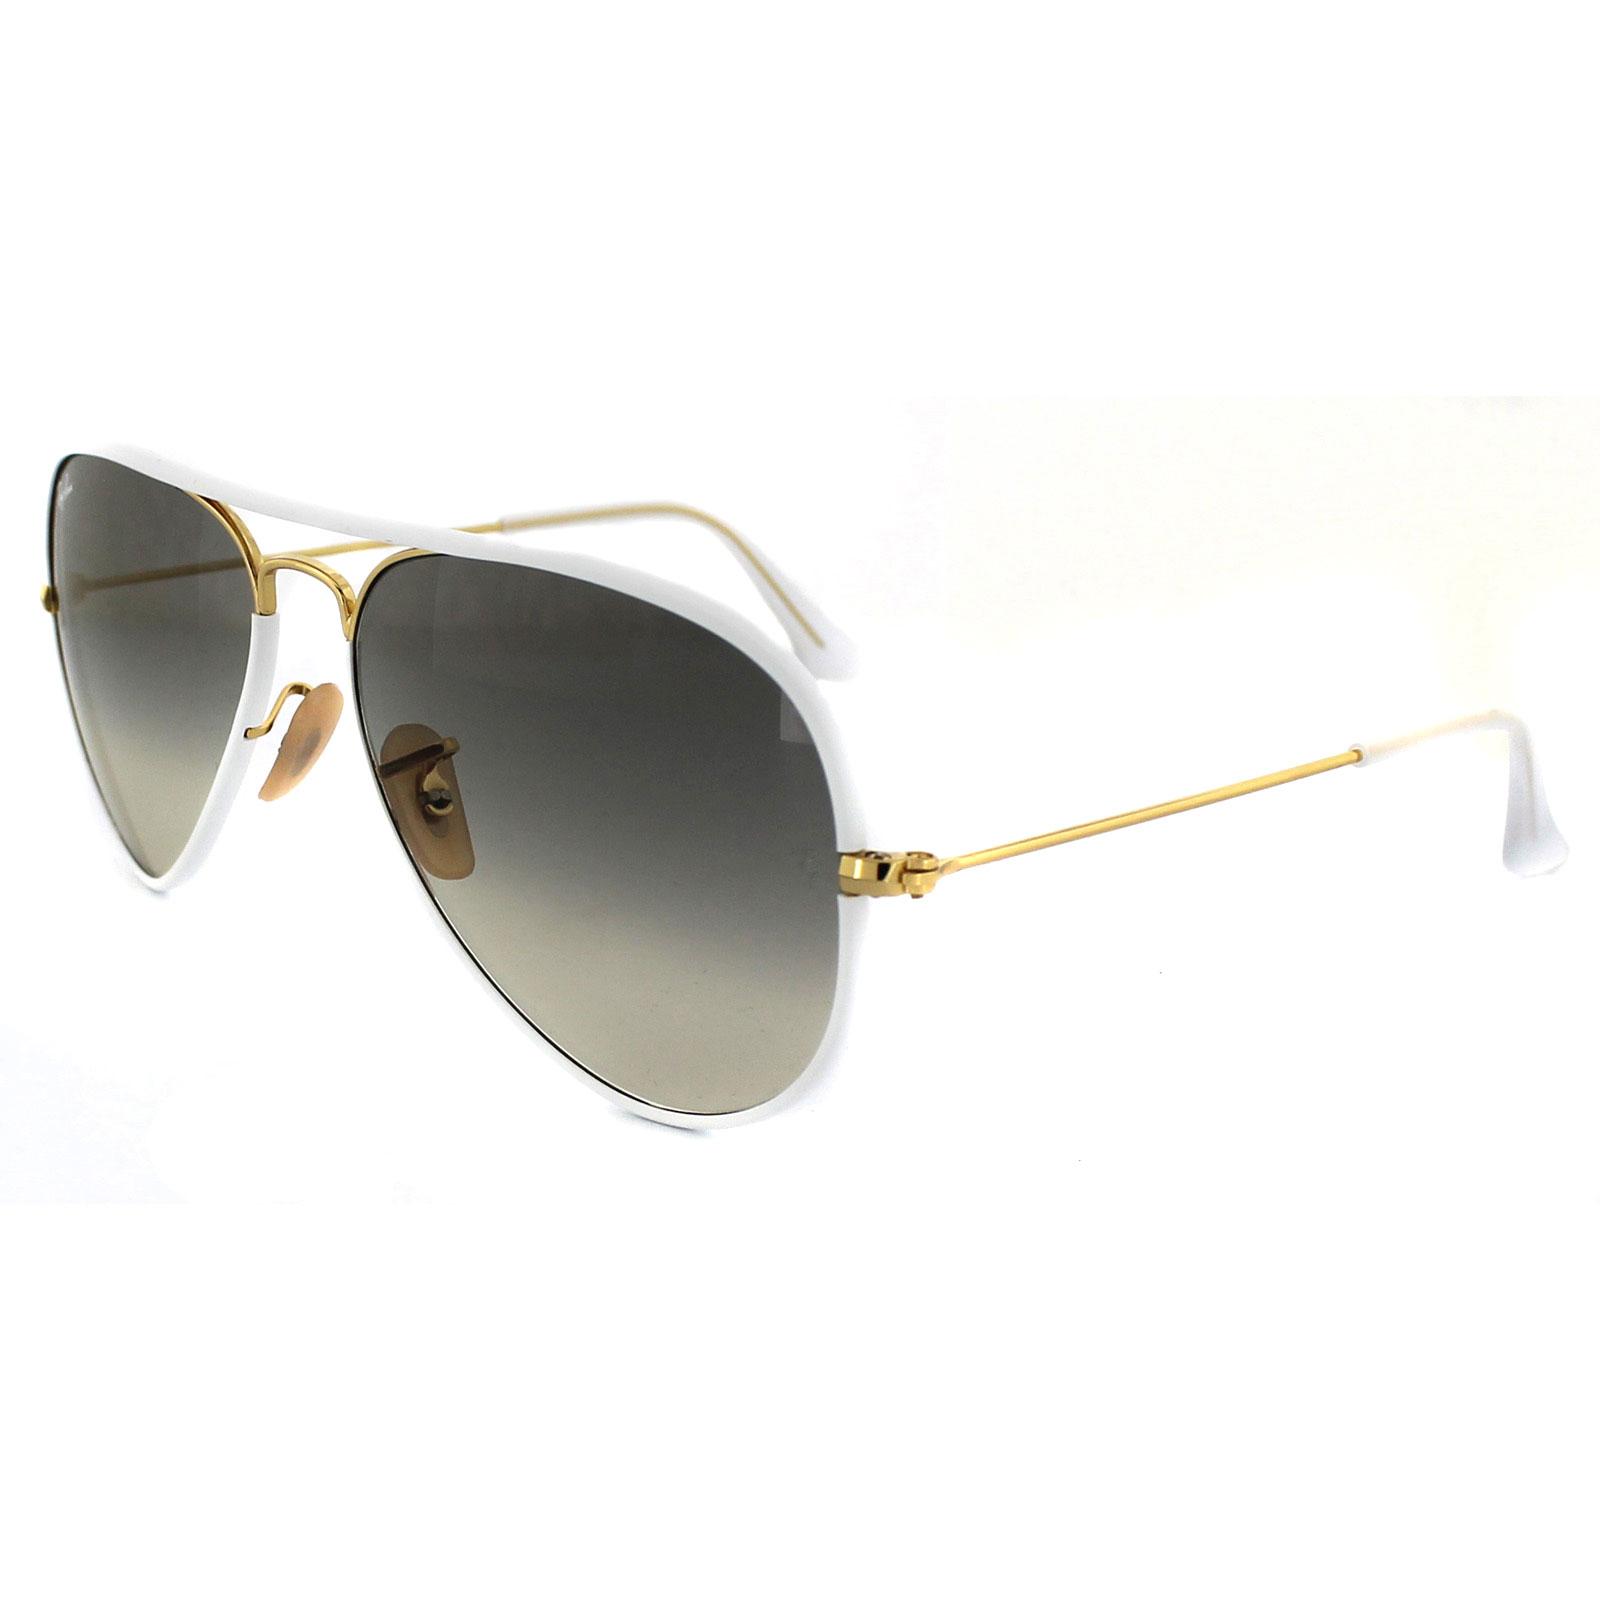 0b0c21f2f9a4a Sentinel Ray-Ban Sunglasses Aviator Full Colour 3025JM 146 32 White Gold  Grey Gradient M